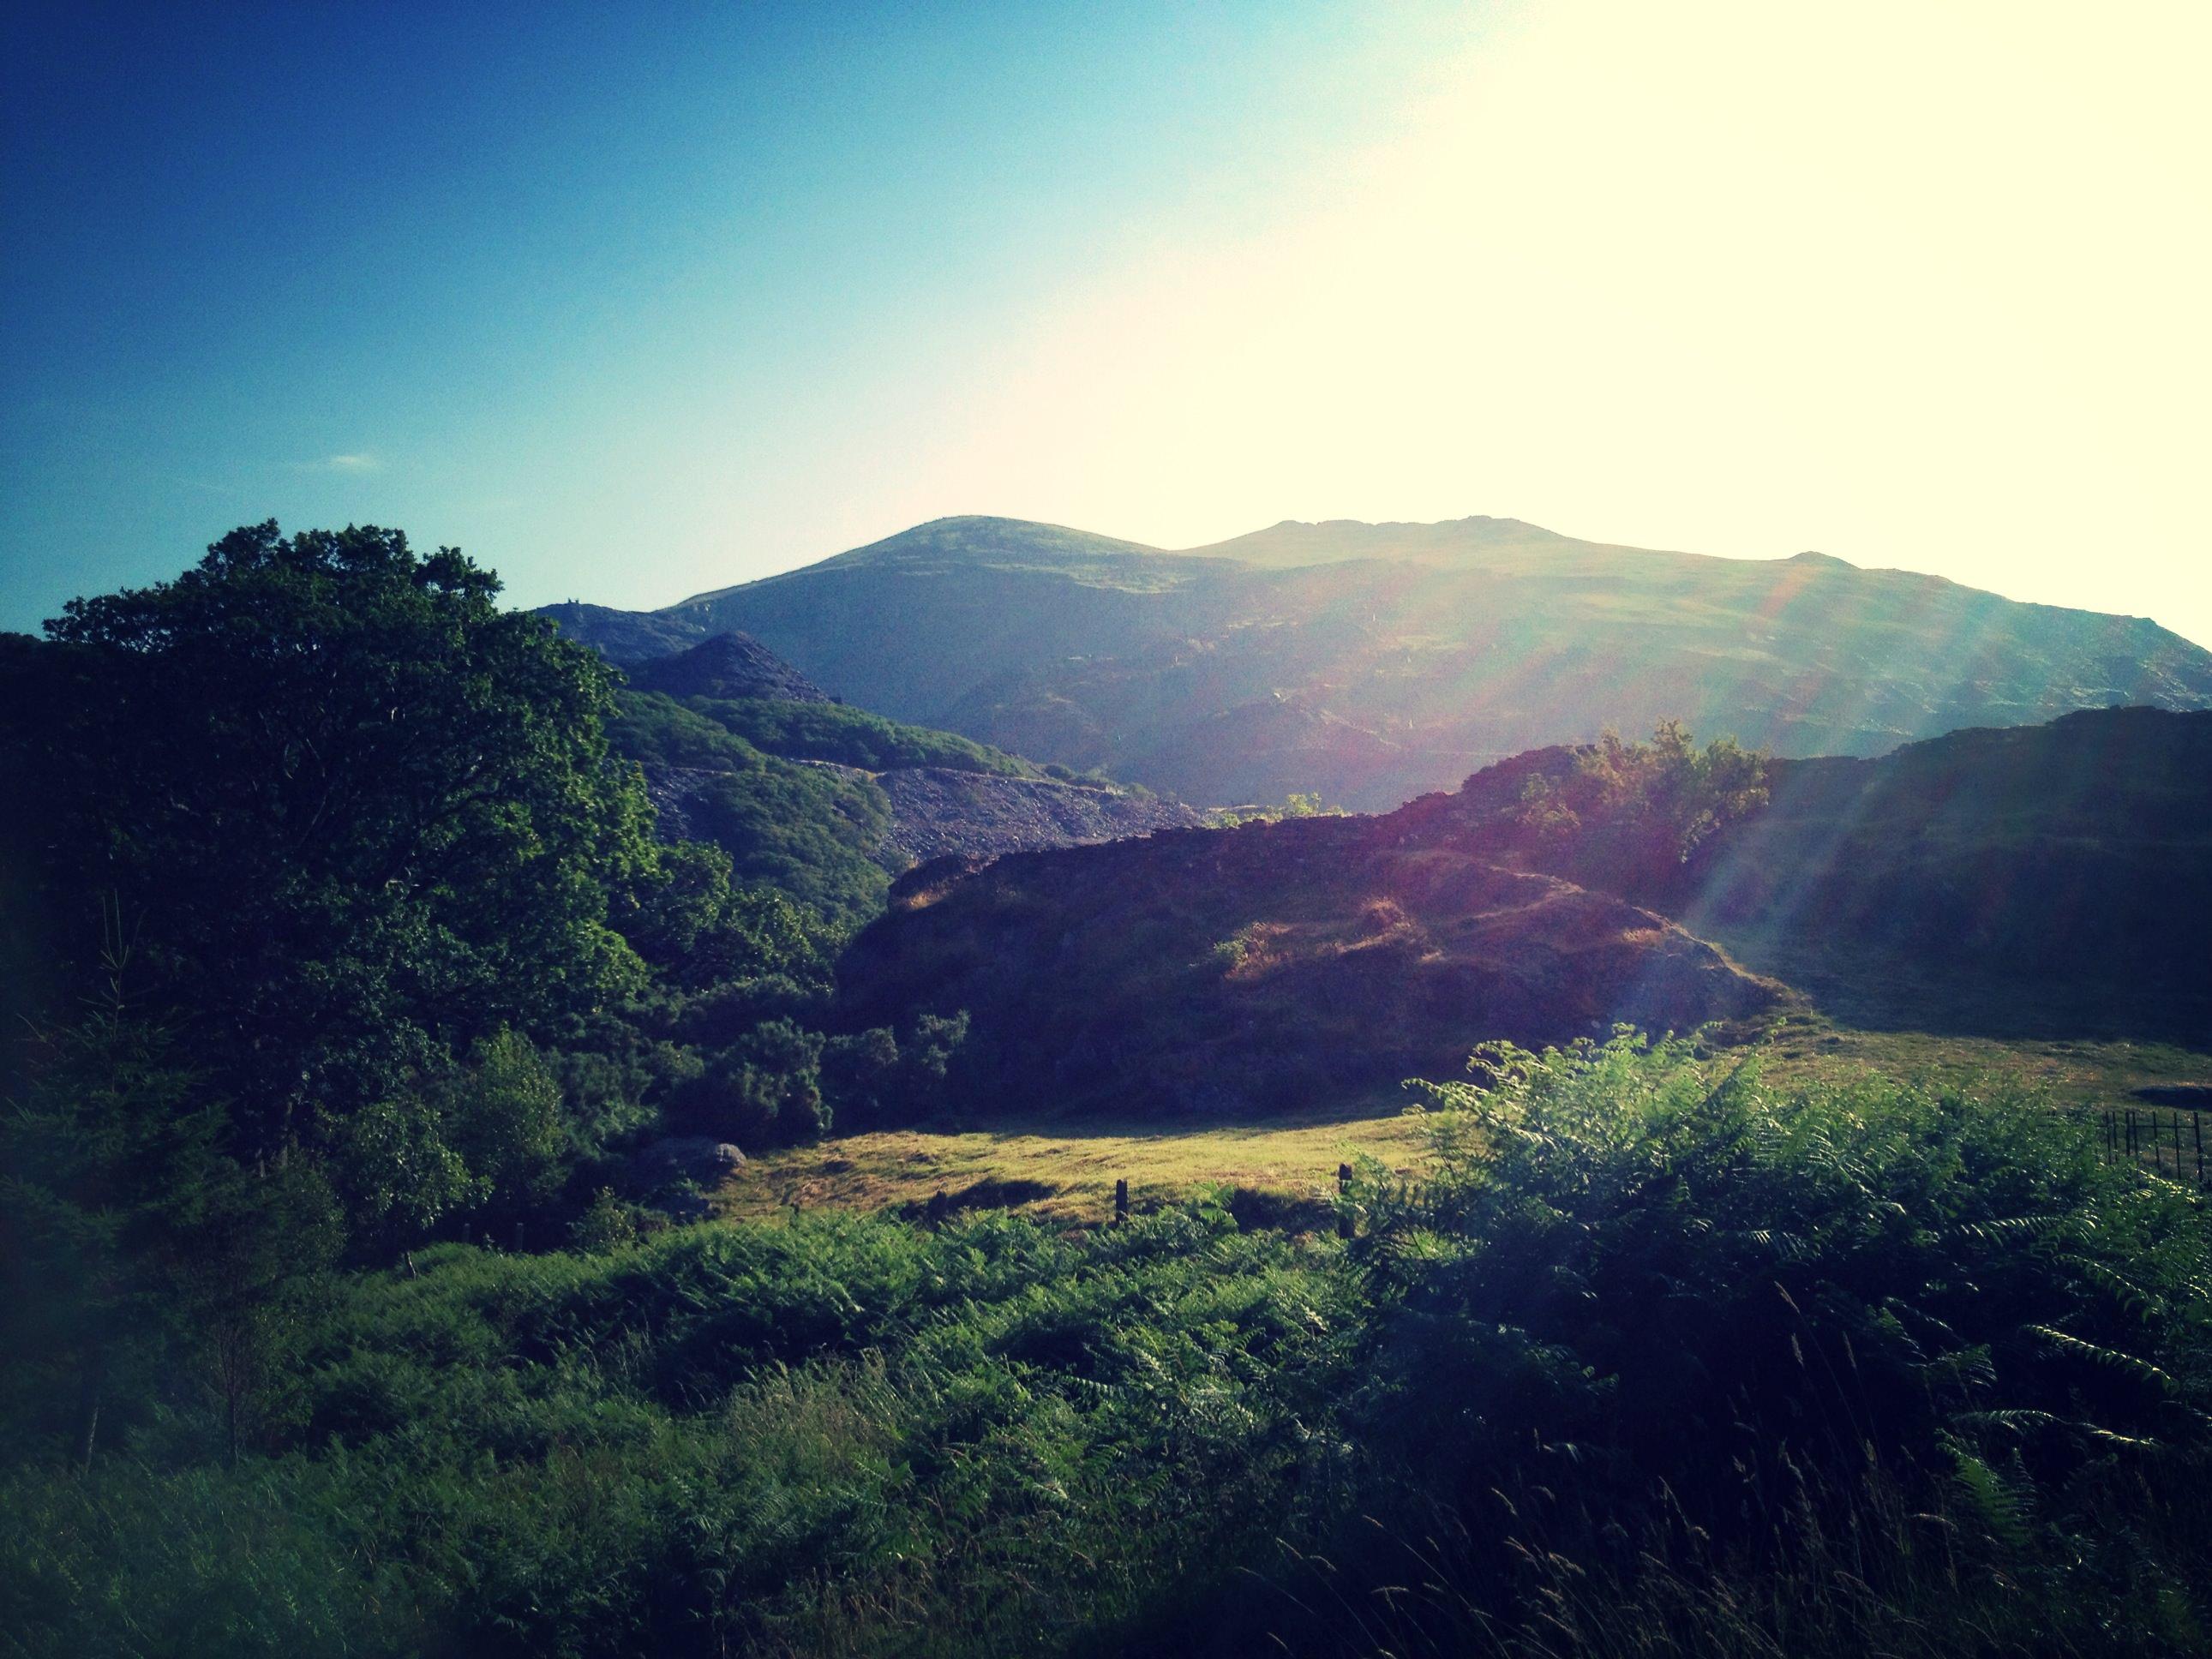 Beauty of Snowdonia